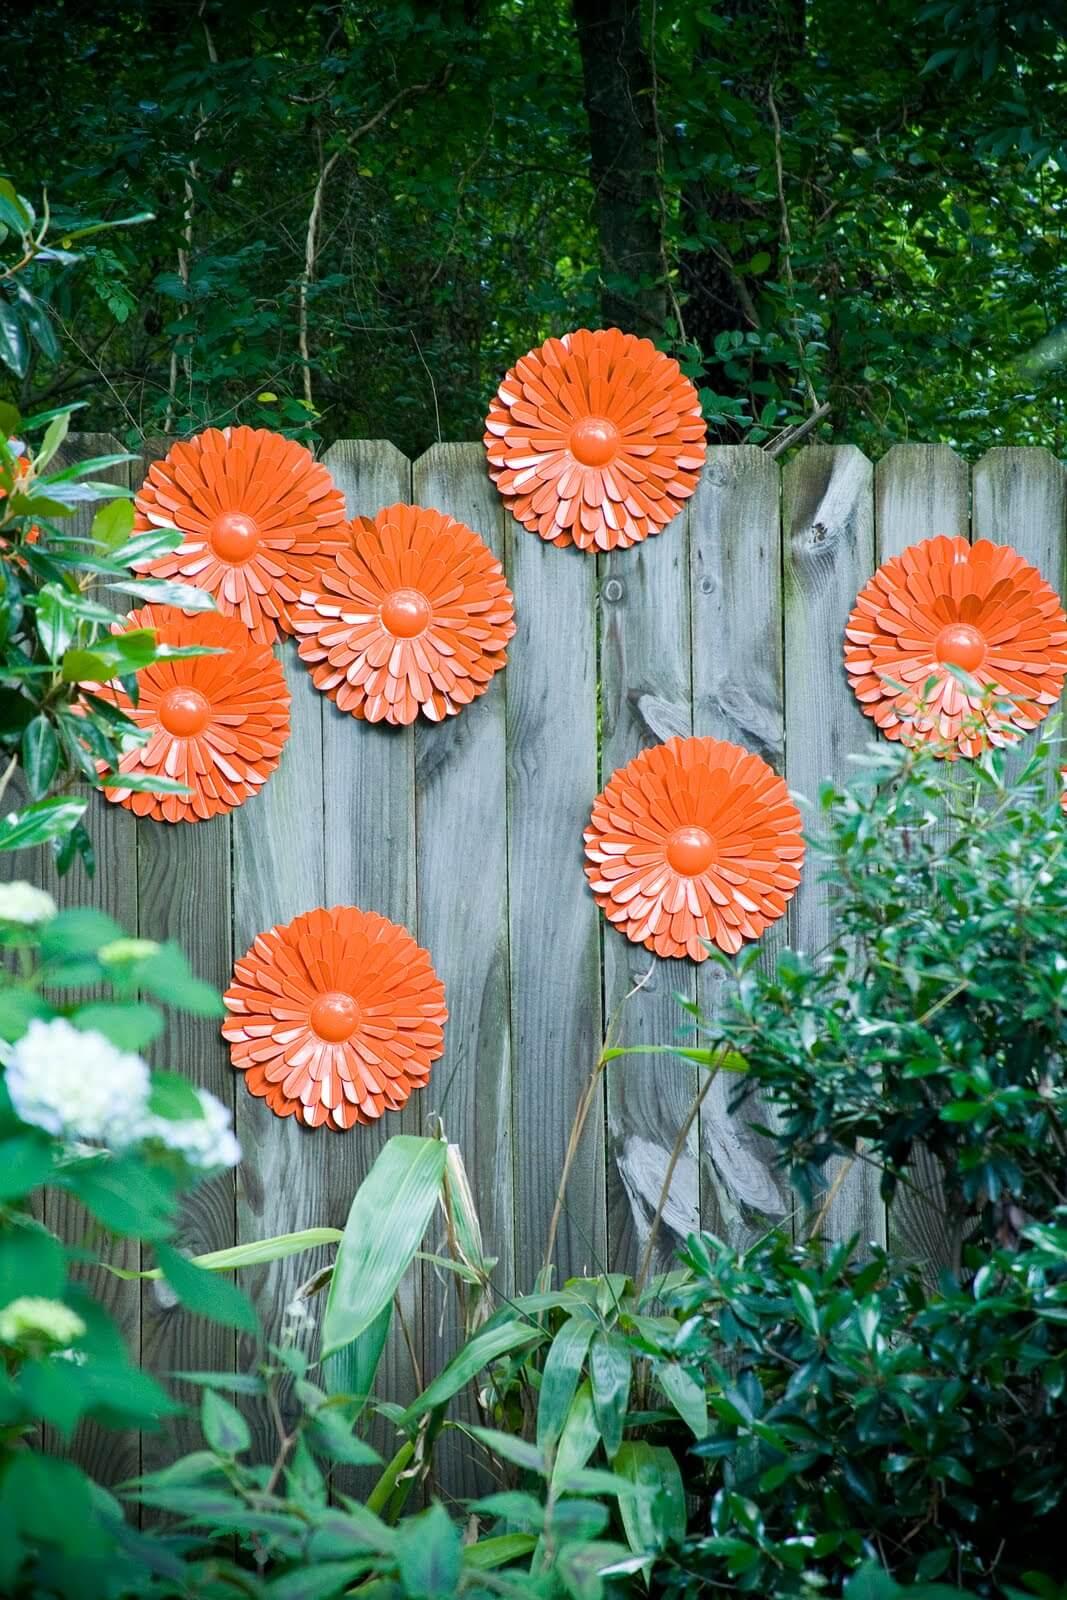 Brilliant Orange Floral Decorations on the Fence